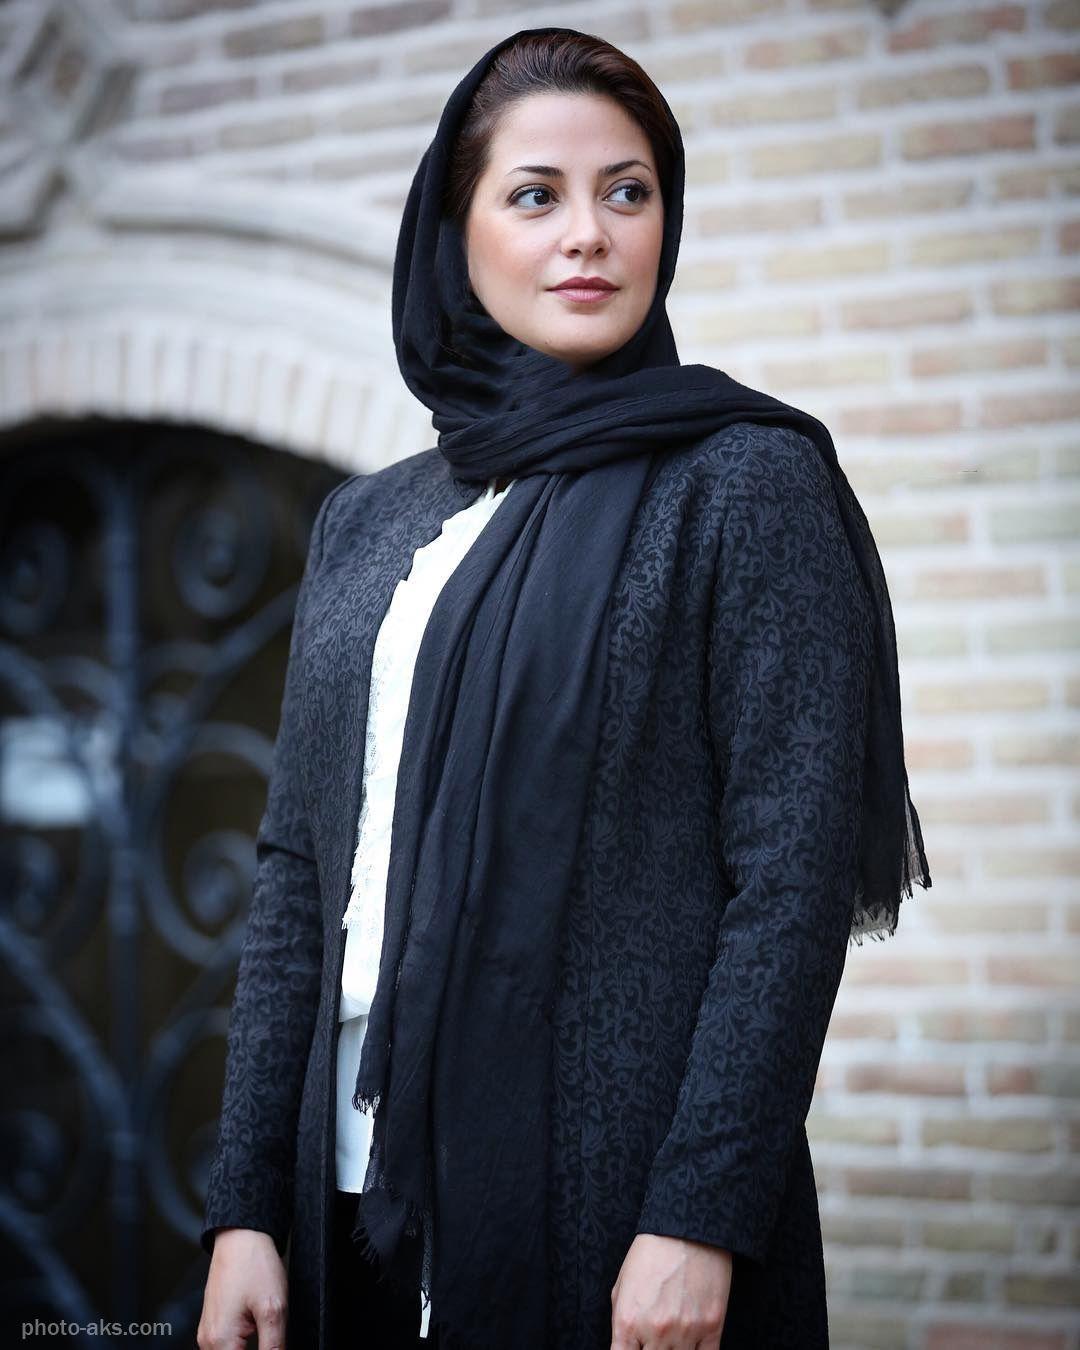 Iran Girls Sxe Images - Photo Porno-7028